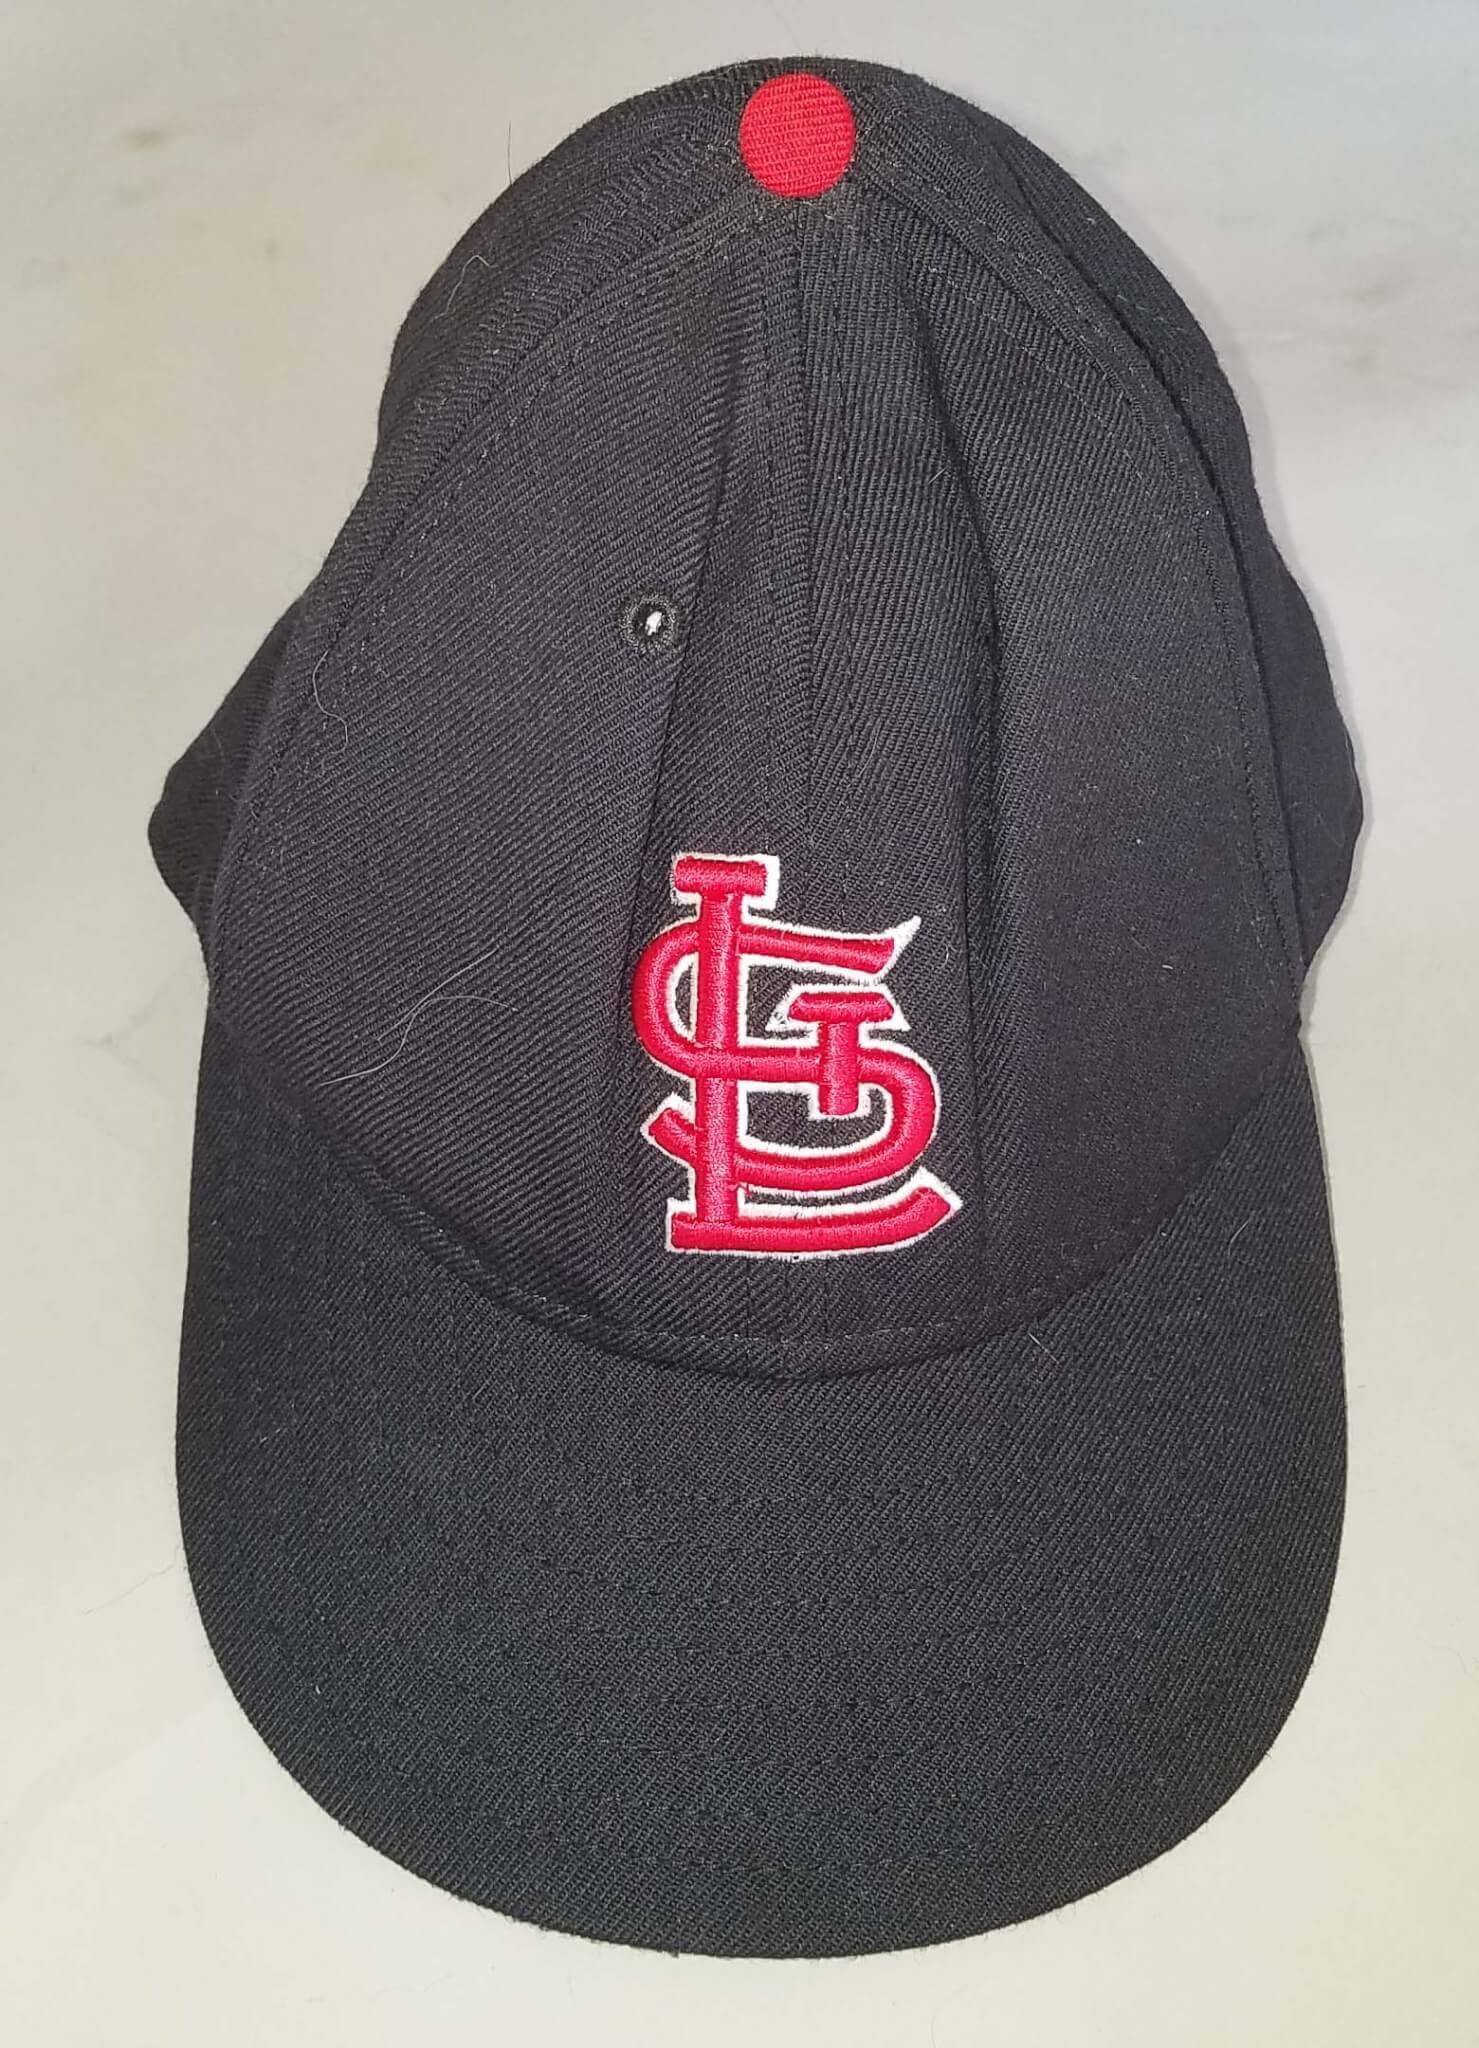 Mark McGwire St. Louis Cardinals #25 Game-Worn Cap COA 100% Authentic Team